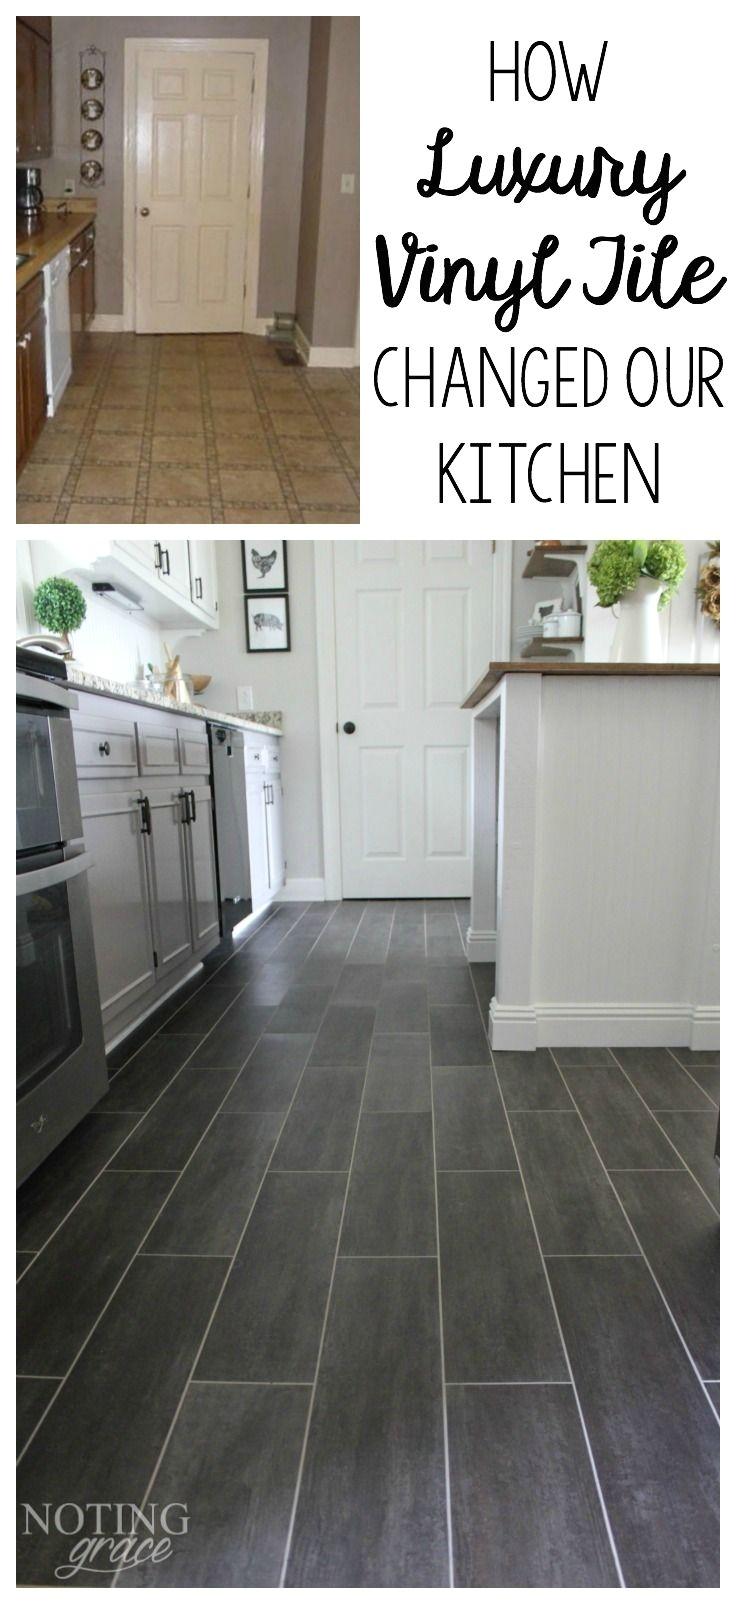 diy kitchen flooring pinterest luxury vinyl tile vinyl tiles and luxury vinyl